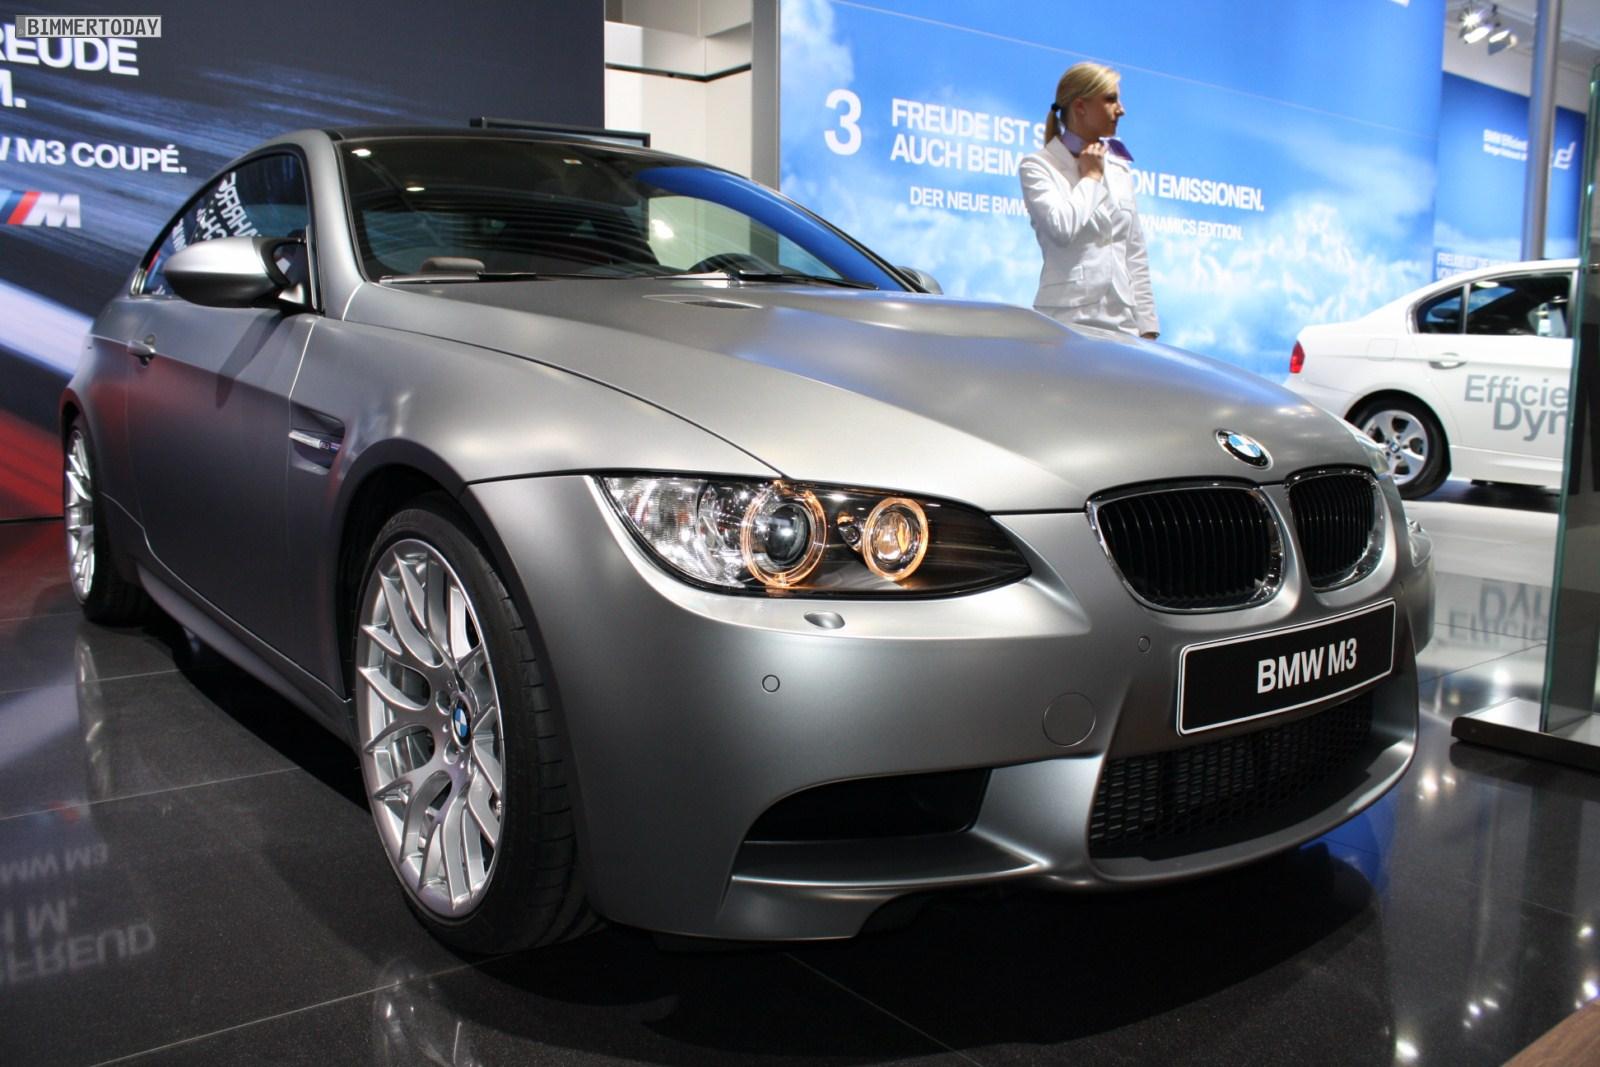 2010 leipzig auto show: bmw m3 coupe in frozen grey metallic